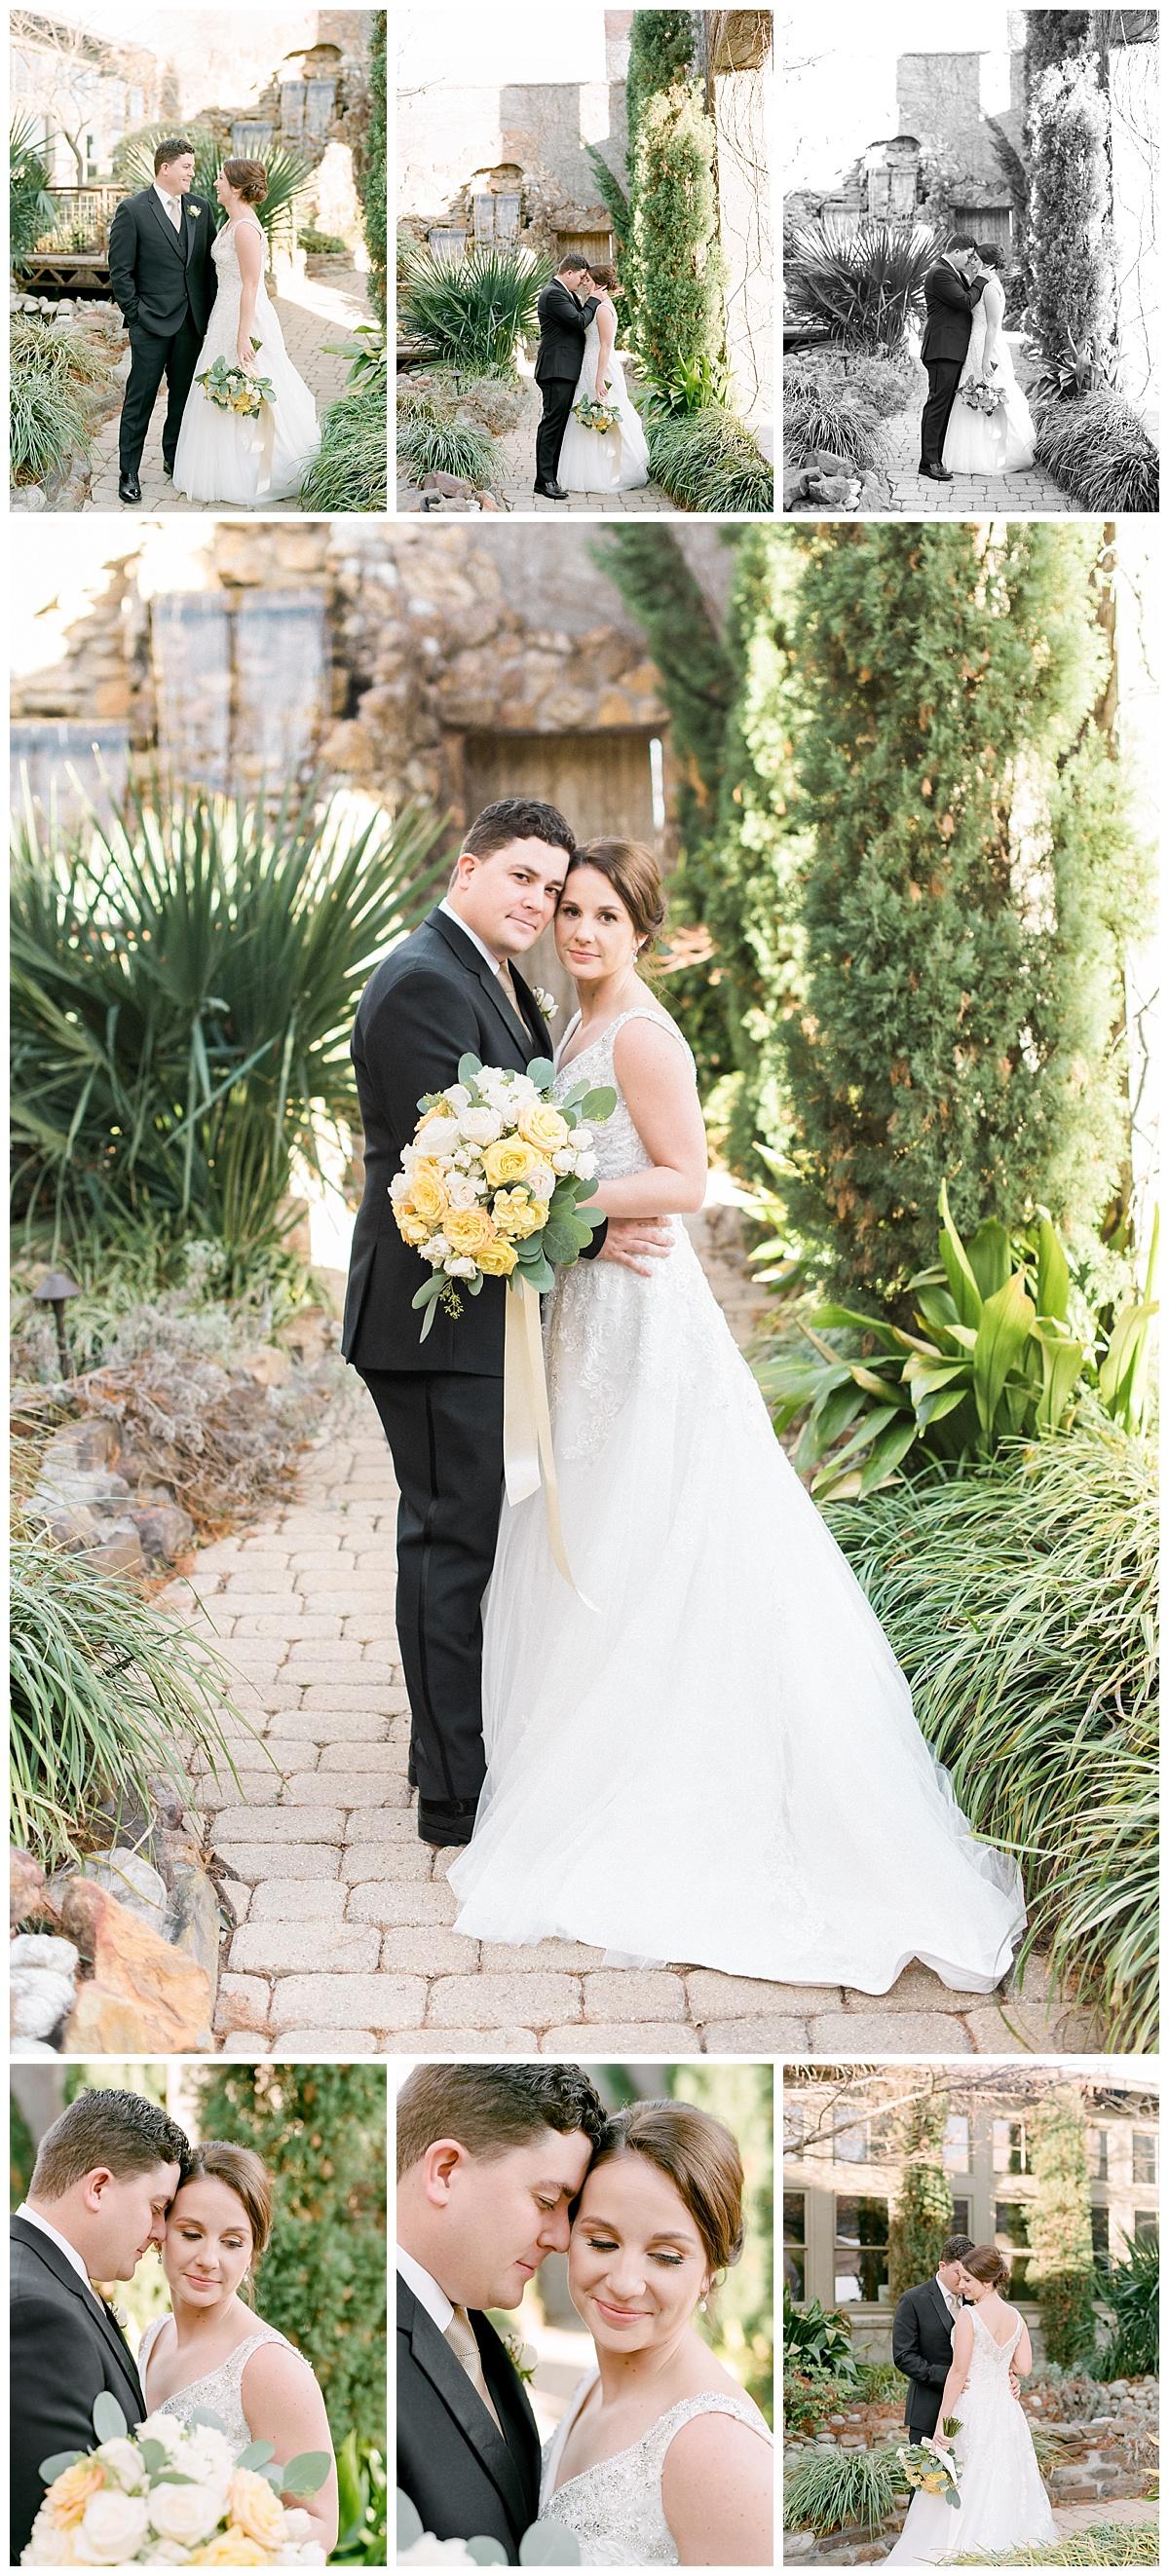 the-cotton-mill-wedding-ar-photography-6.jpg